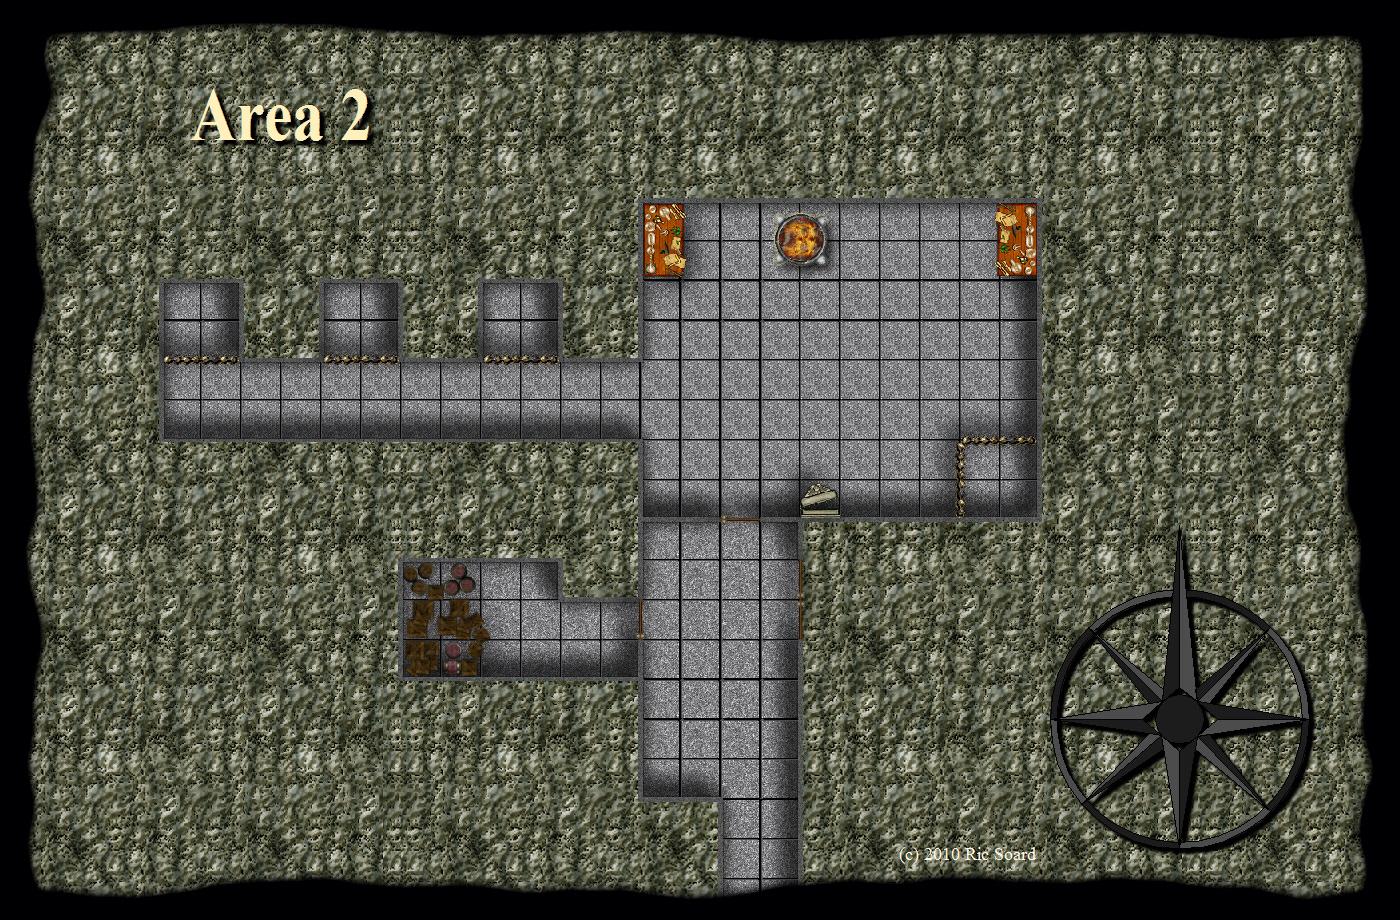 Area 2 24 x 36 small